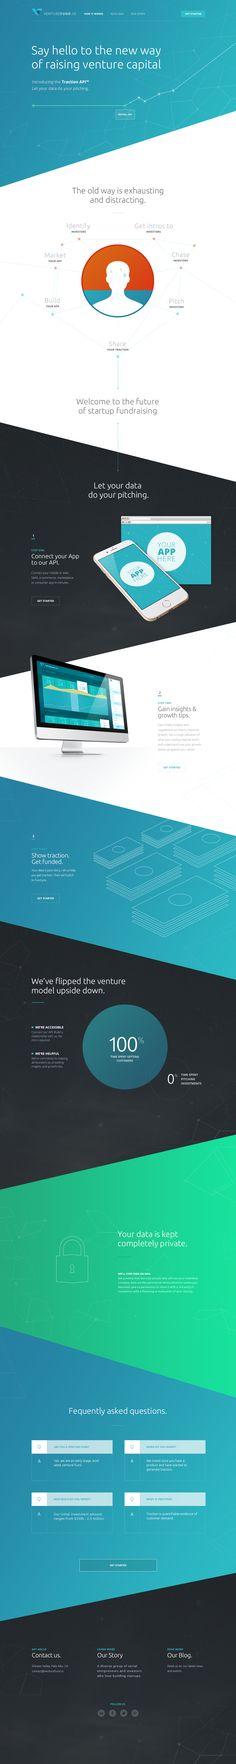 One Page Portfolio For Web Designerdeveloper And Opera Signer - Venture capital website template